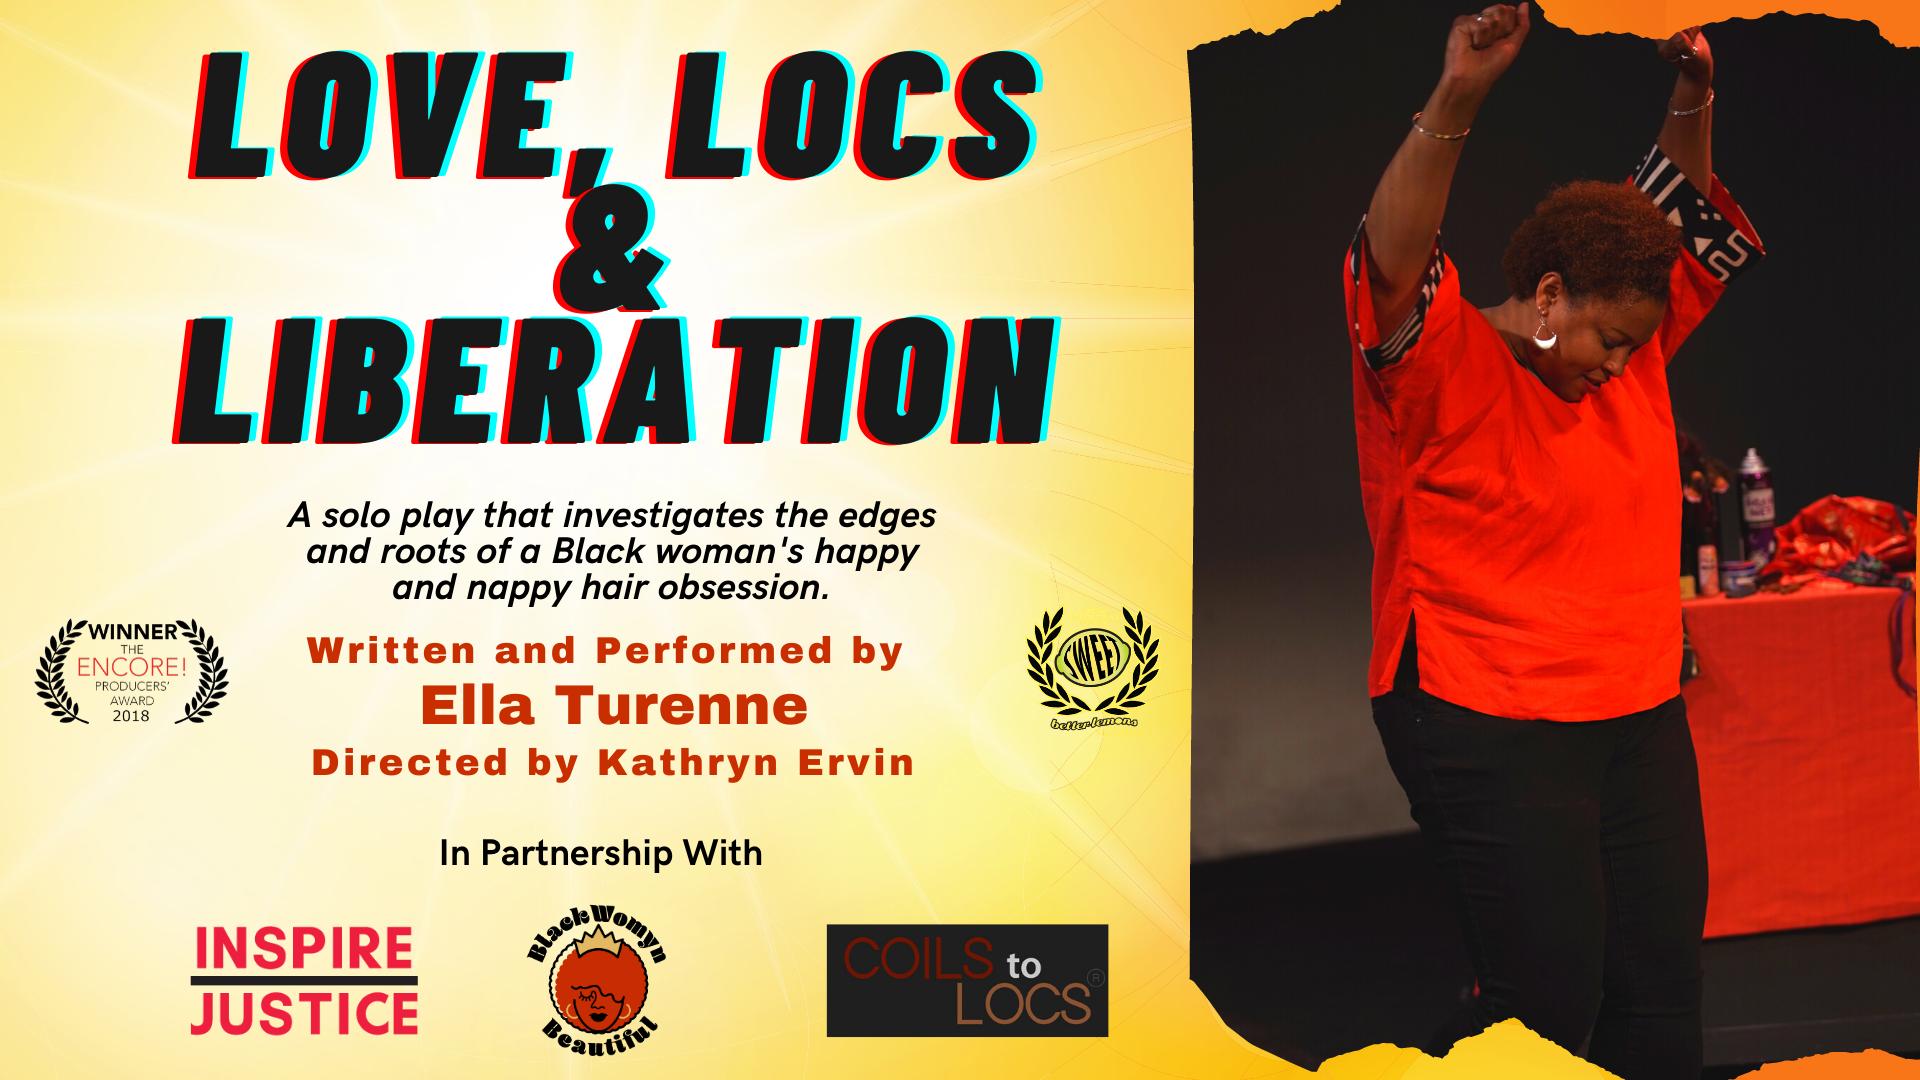 Love, Locs & Liberation Feb 19 @ 7pm PST